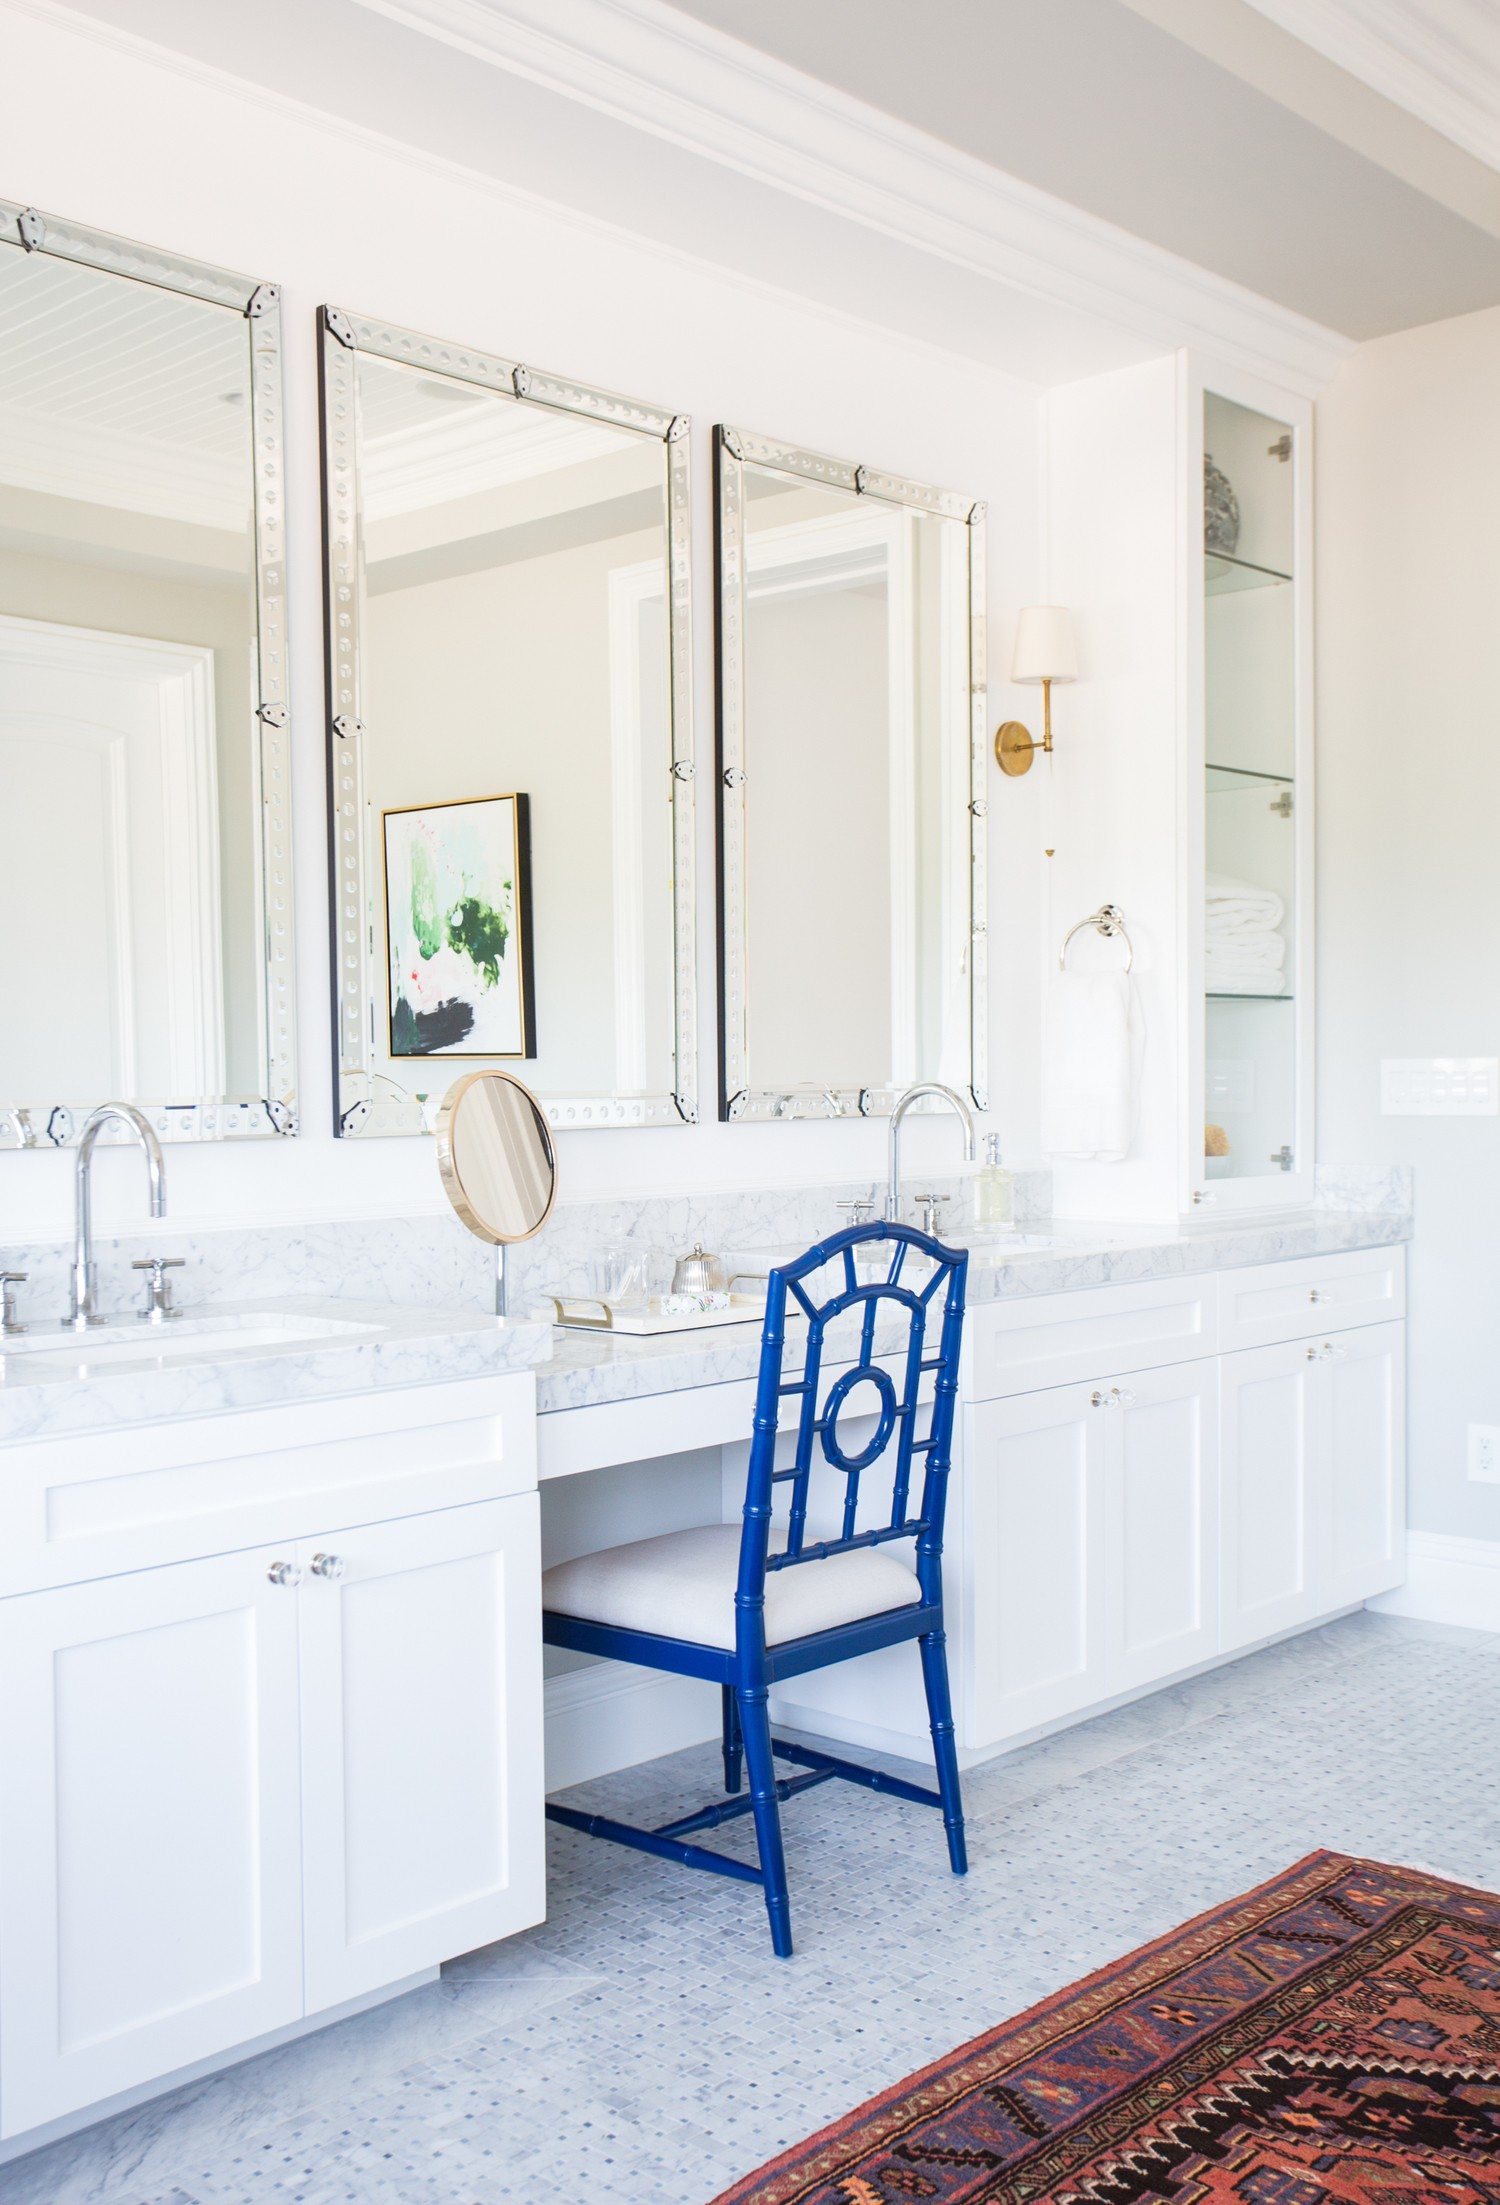 Master+Bathroom+Vanity+with+Venetian+Mirrors+__+Studio+McGee.jpg